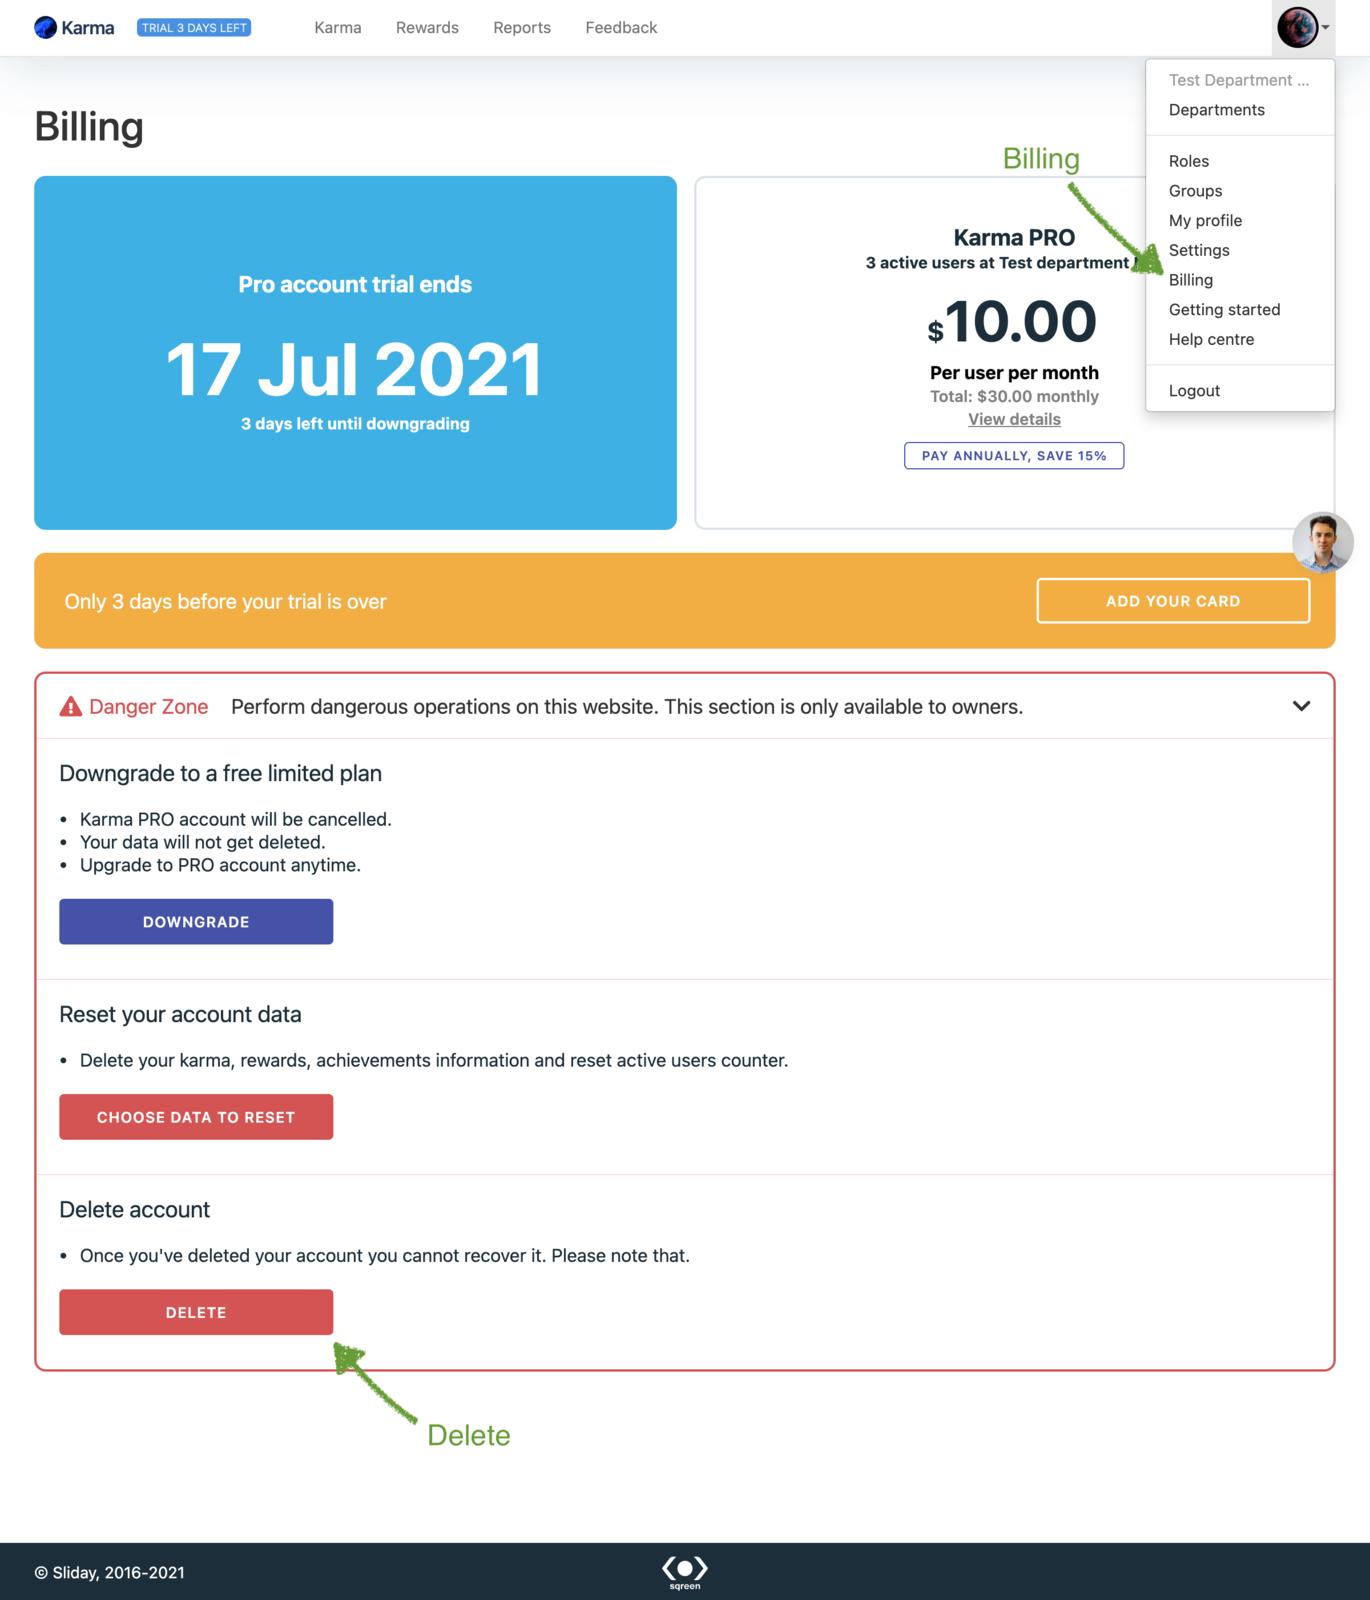 How to delete Karma from Slack